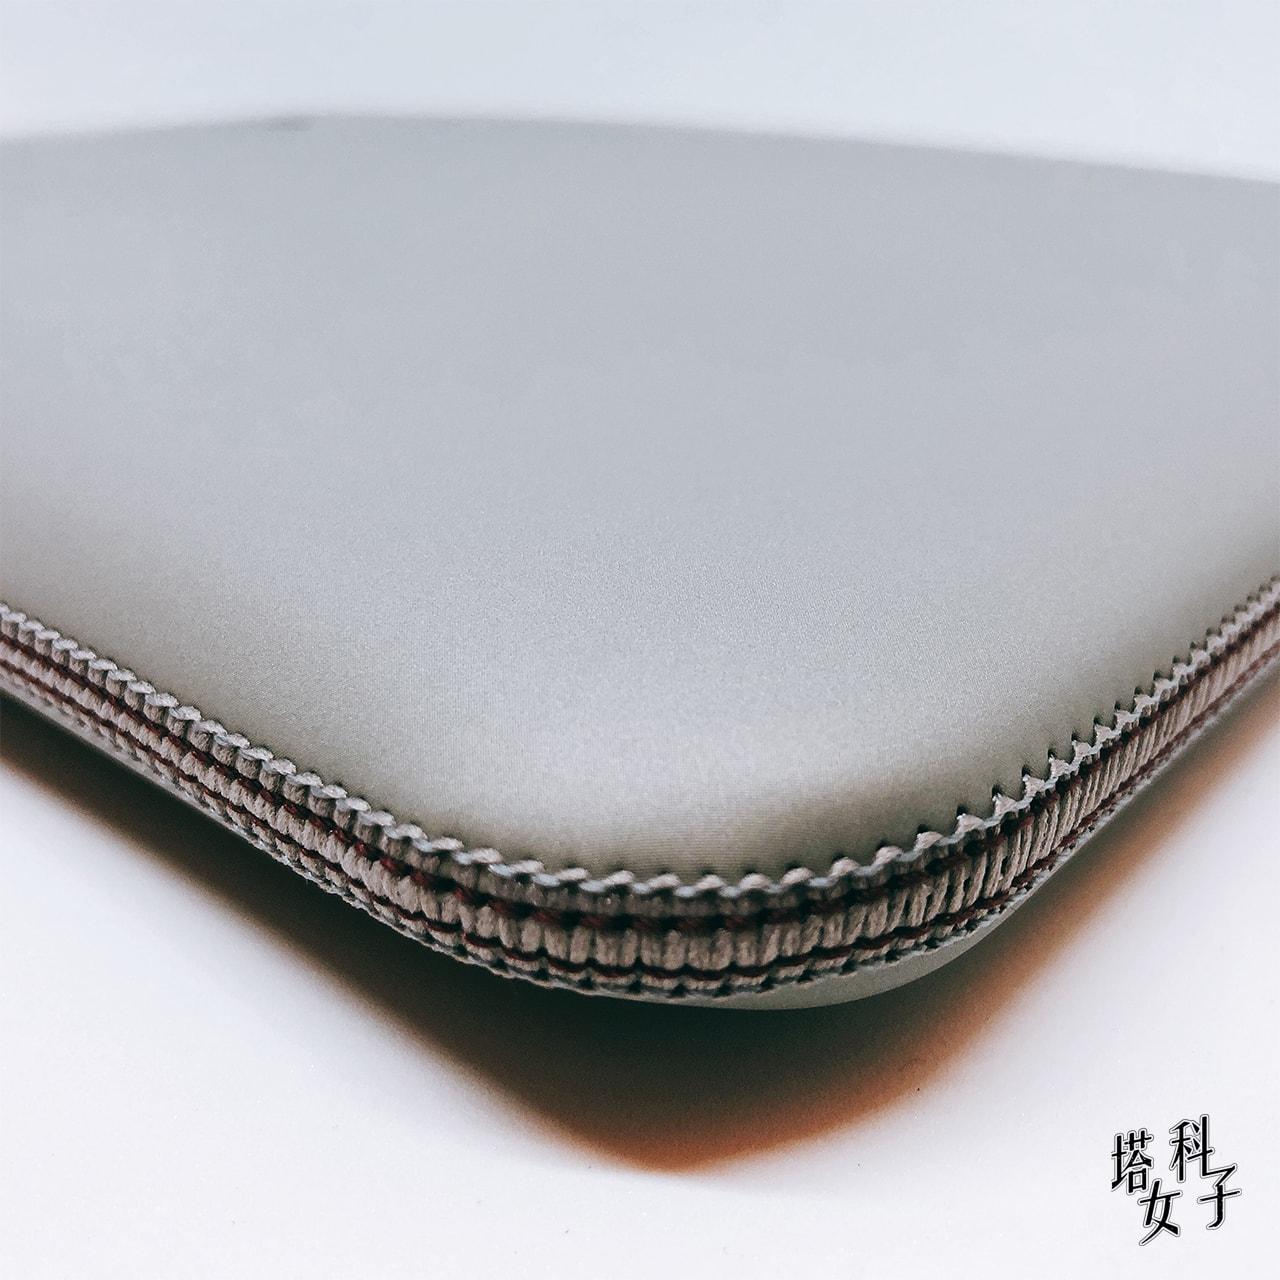 Acme Made - Skinny Sleeve 側面